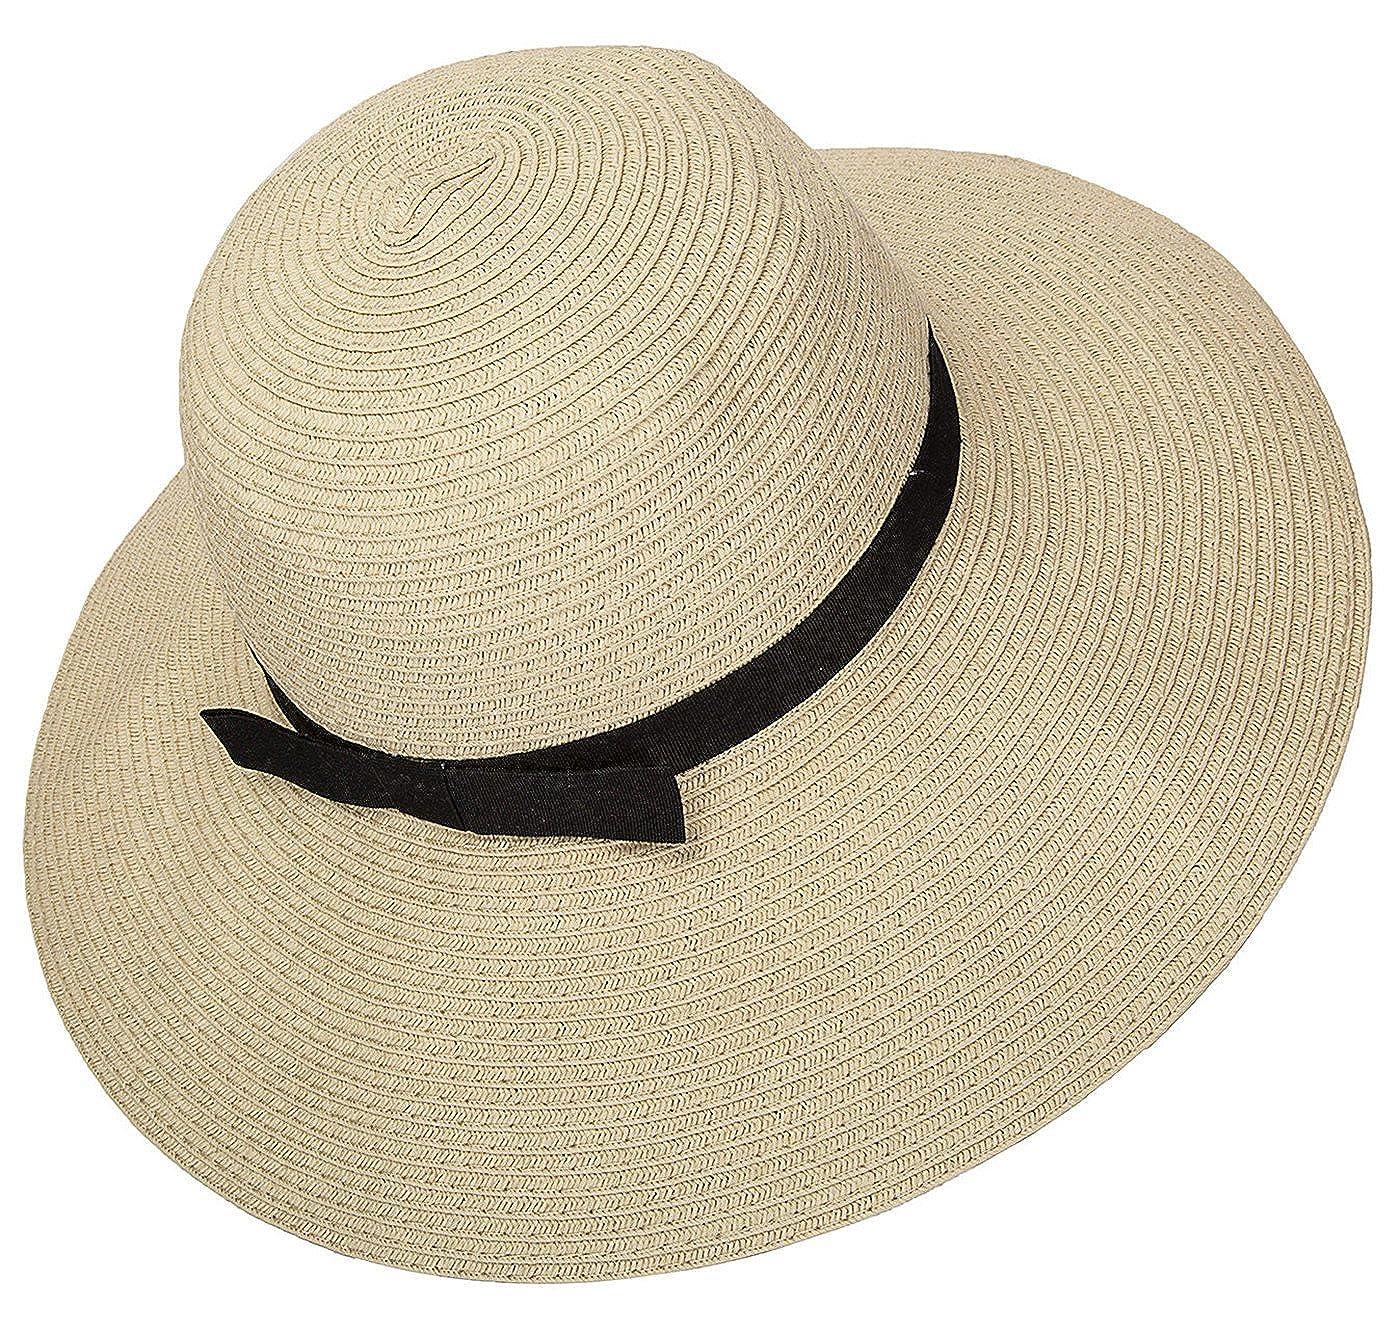 bddc8d3f09ca7 Janrely Women Floppy Sun Beach Straw Hats Wide Brim Packable Summer Cap  (Beige) at Amazon Women s Clothing store